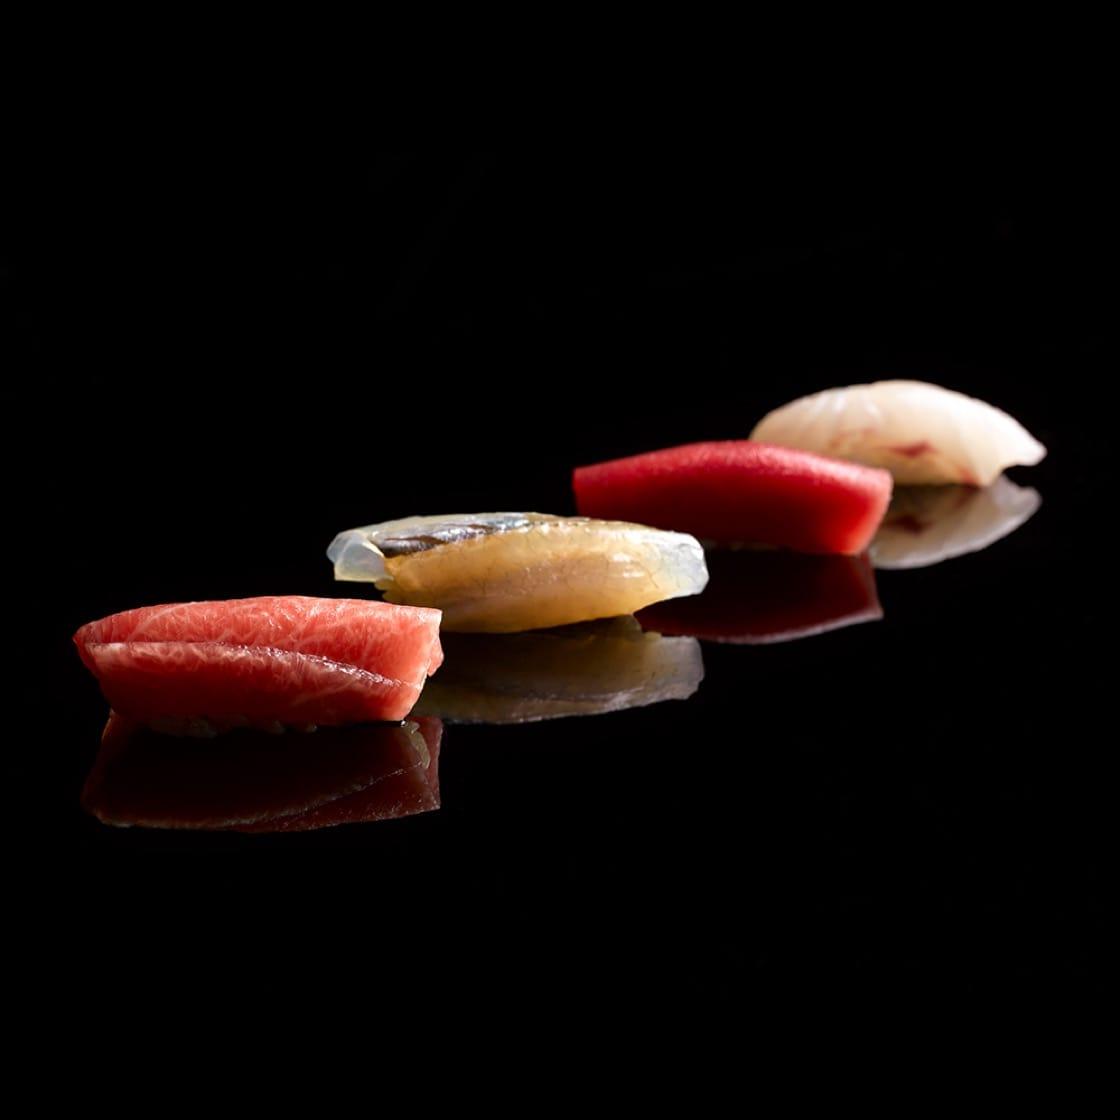 https://d3h1lg3ksw6i6b.cloudfront.net/media/image/2018/07/15/afeb98572a3b42c0a25b92371105bf82_Shoukuwa_sushi.jpg